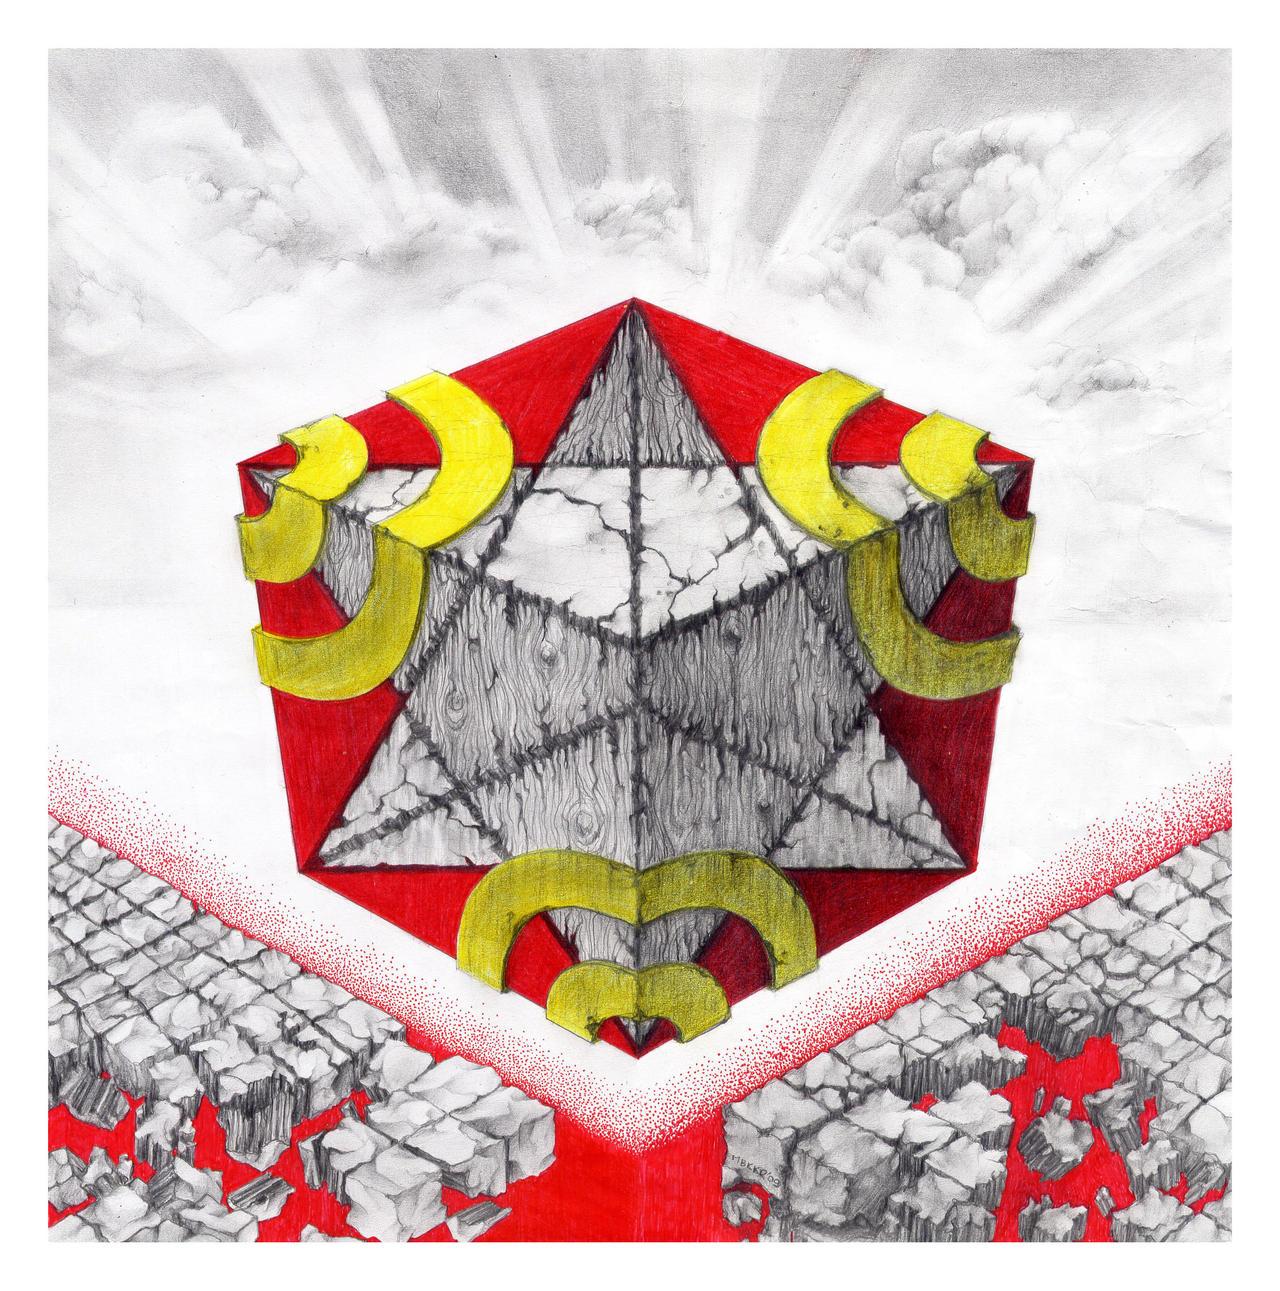 Inner Cube 1 - 2009 by MBKKR